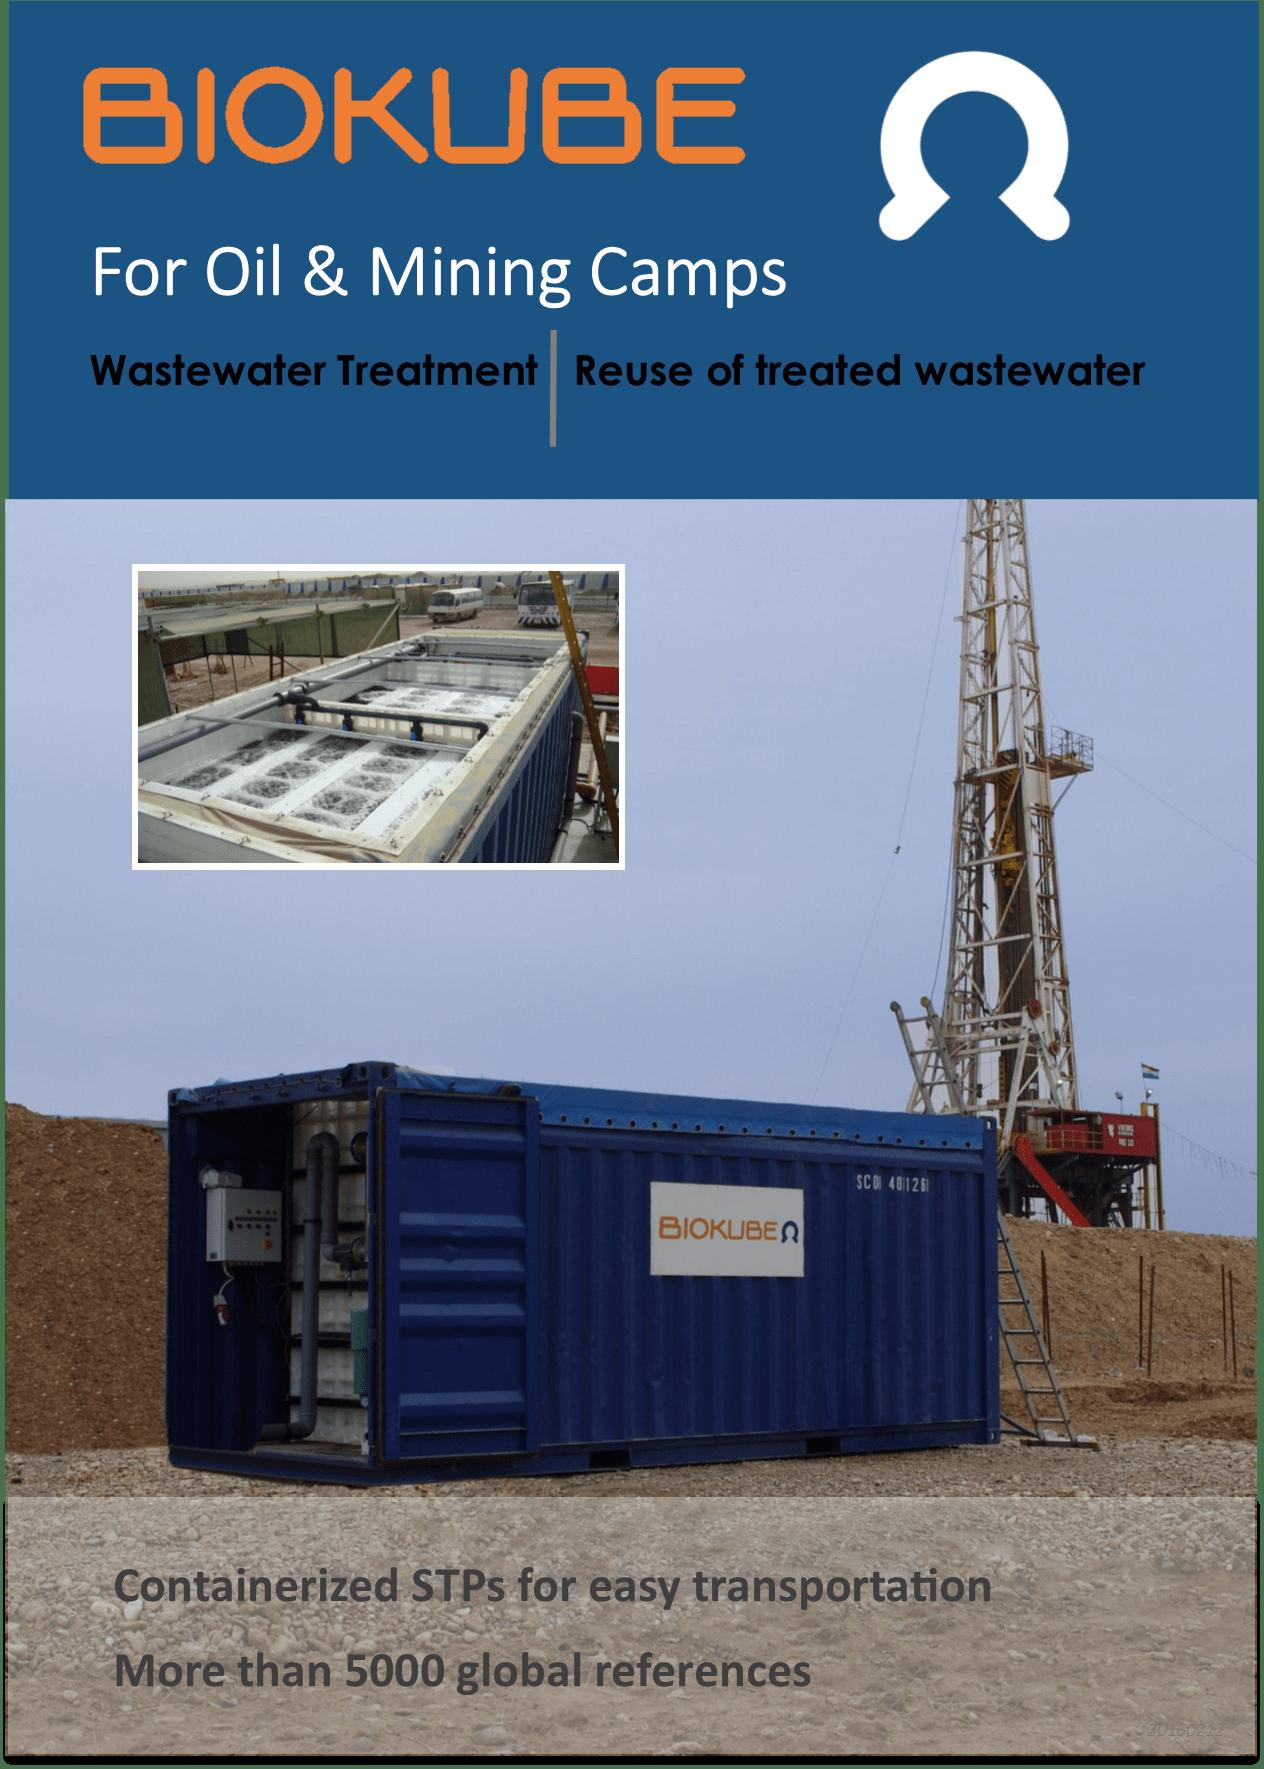 Biokube oil and mining brochure